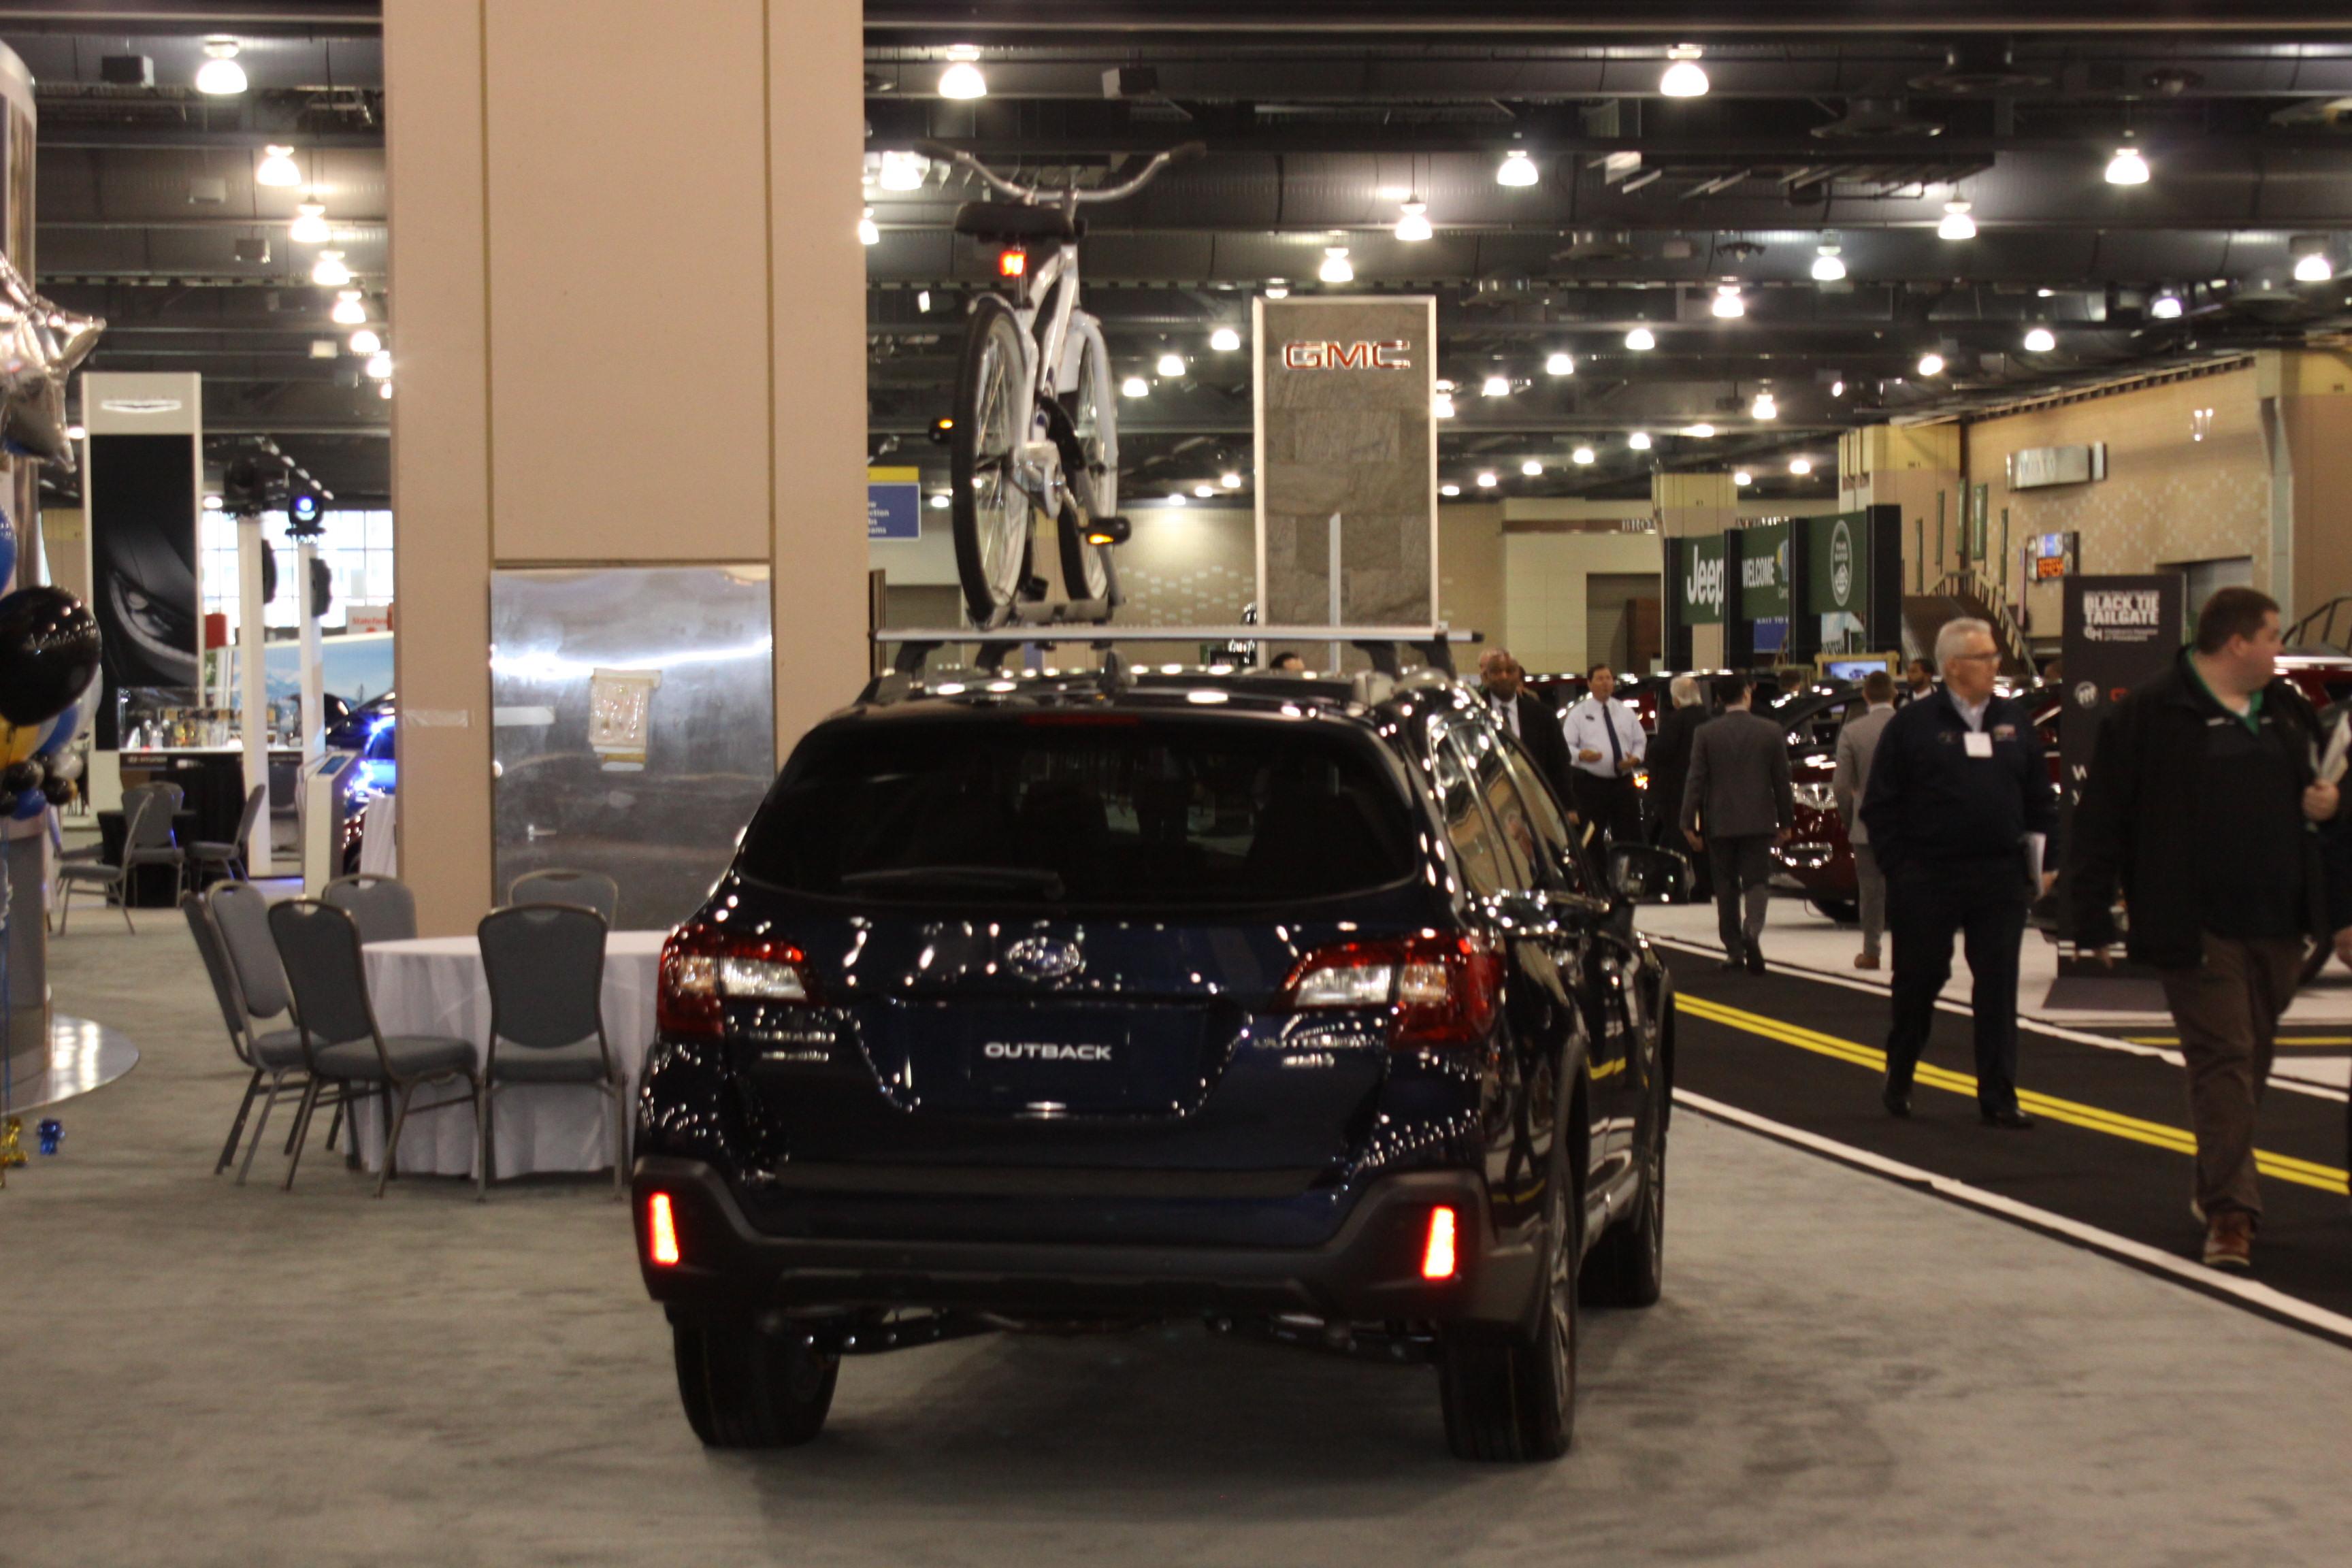 GALLERY Philadelphia Auto Show WTTO - Philadelphia convention center car show